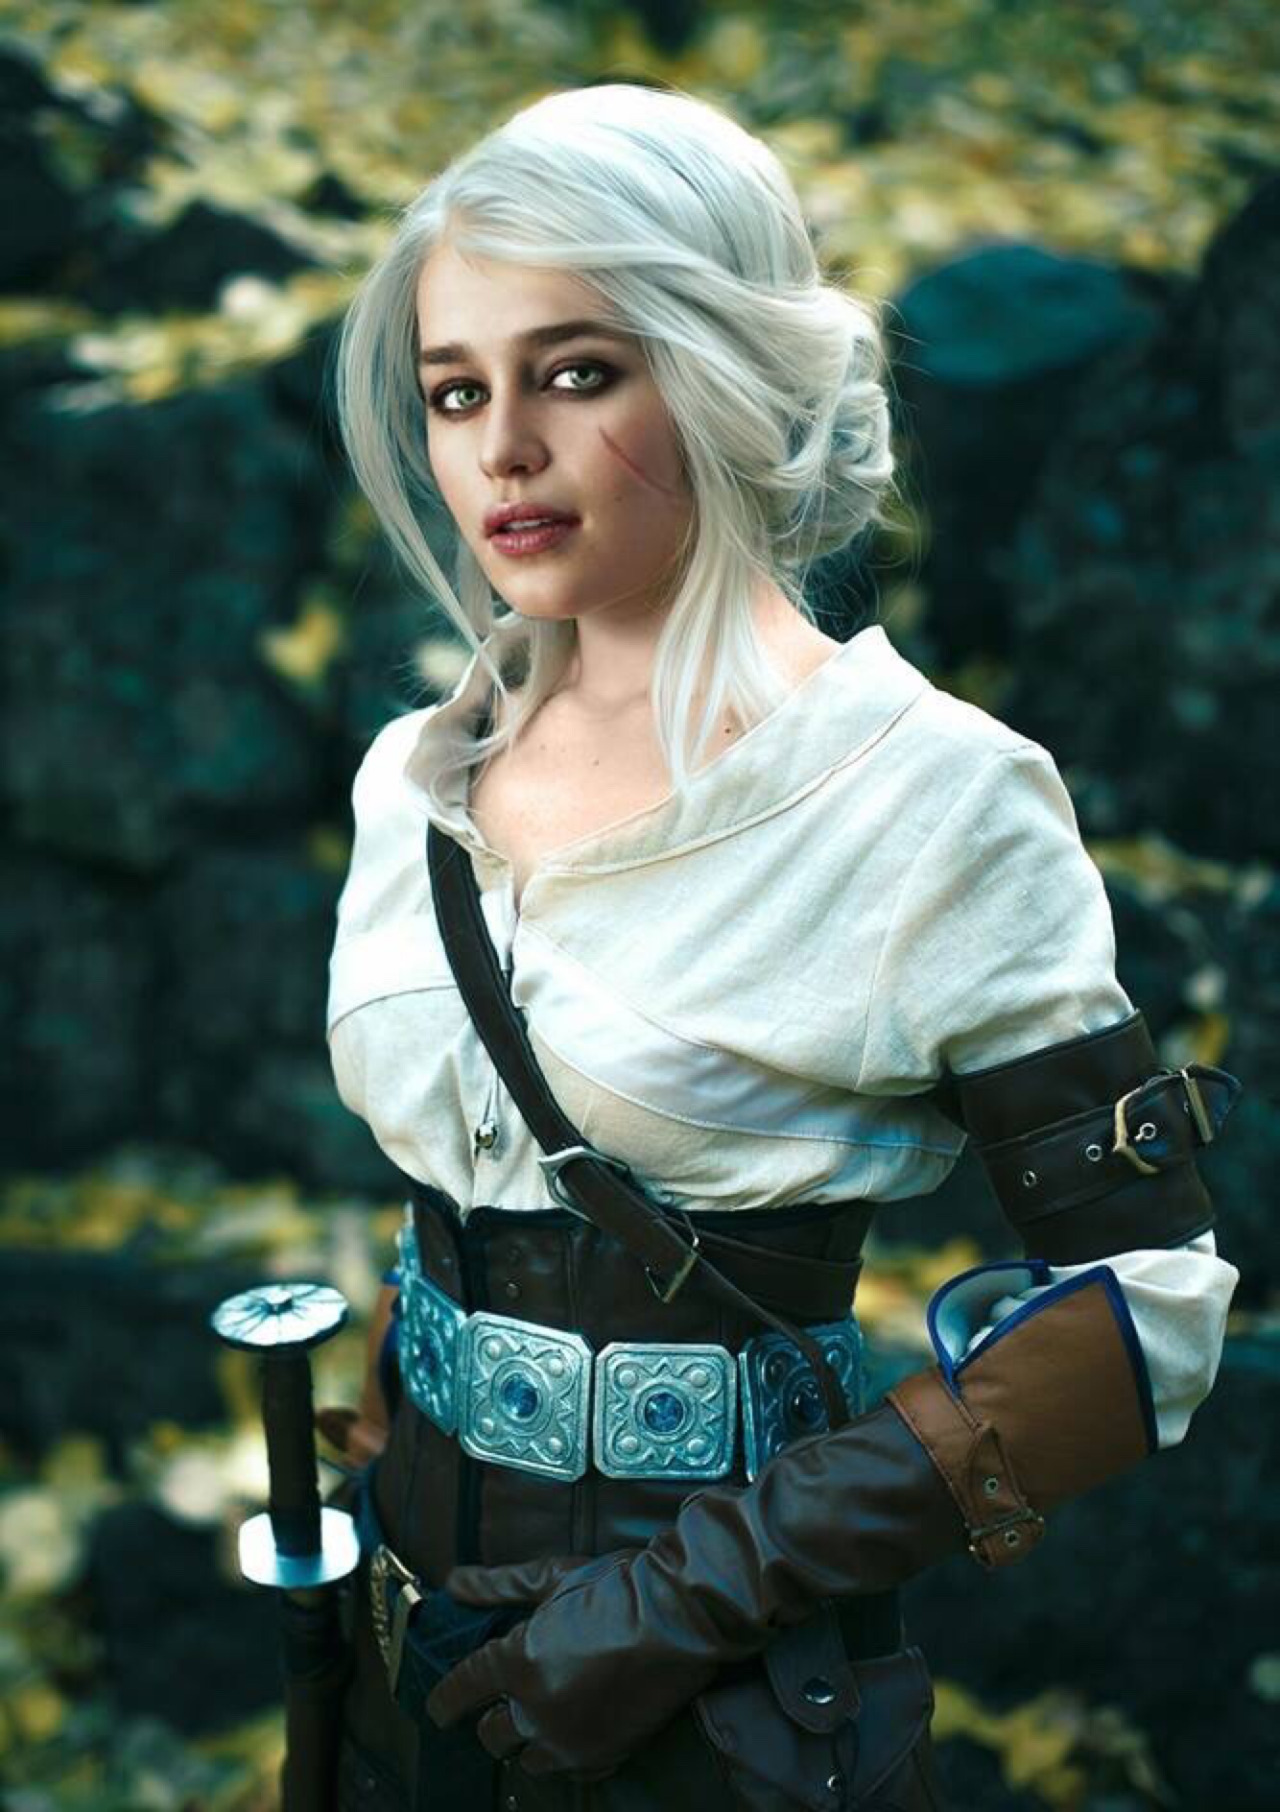 game of thrones, emilia clarke, daenerys targaryen, game of thrones cast, ciri, the witcher 3, photoshop, cosplay